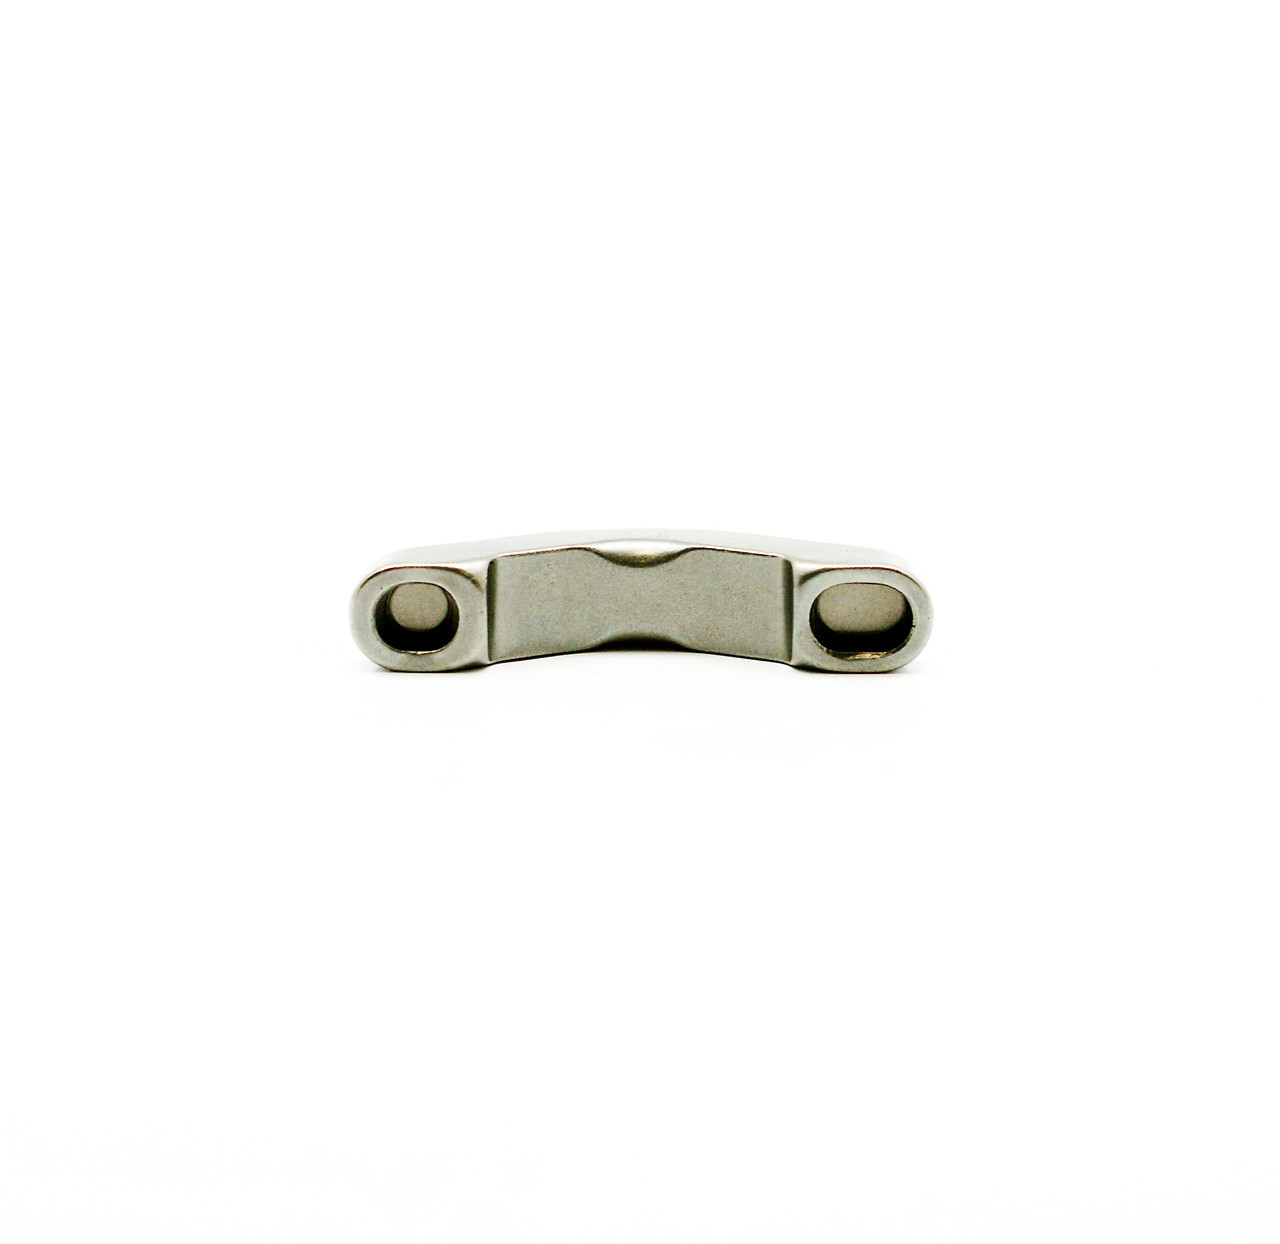 Траверс клапана Cummins B Series C3943626 С3943626 3943626